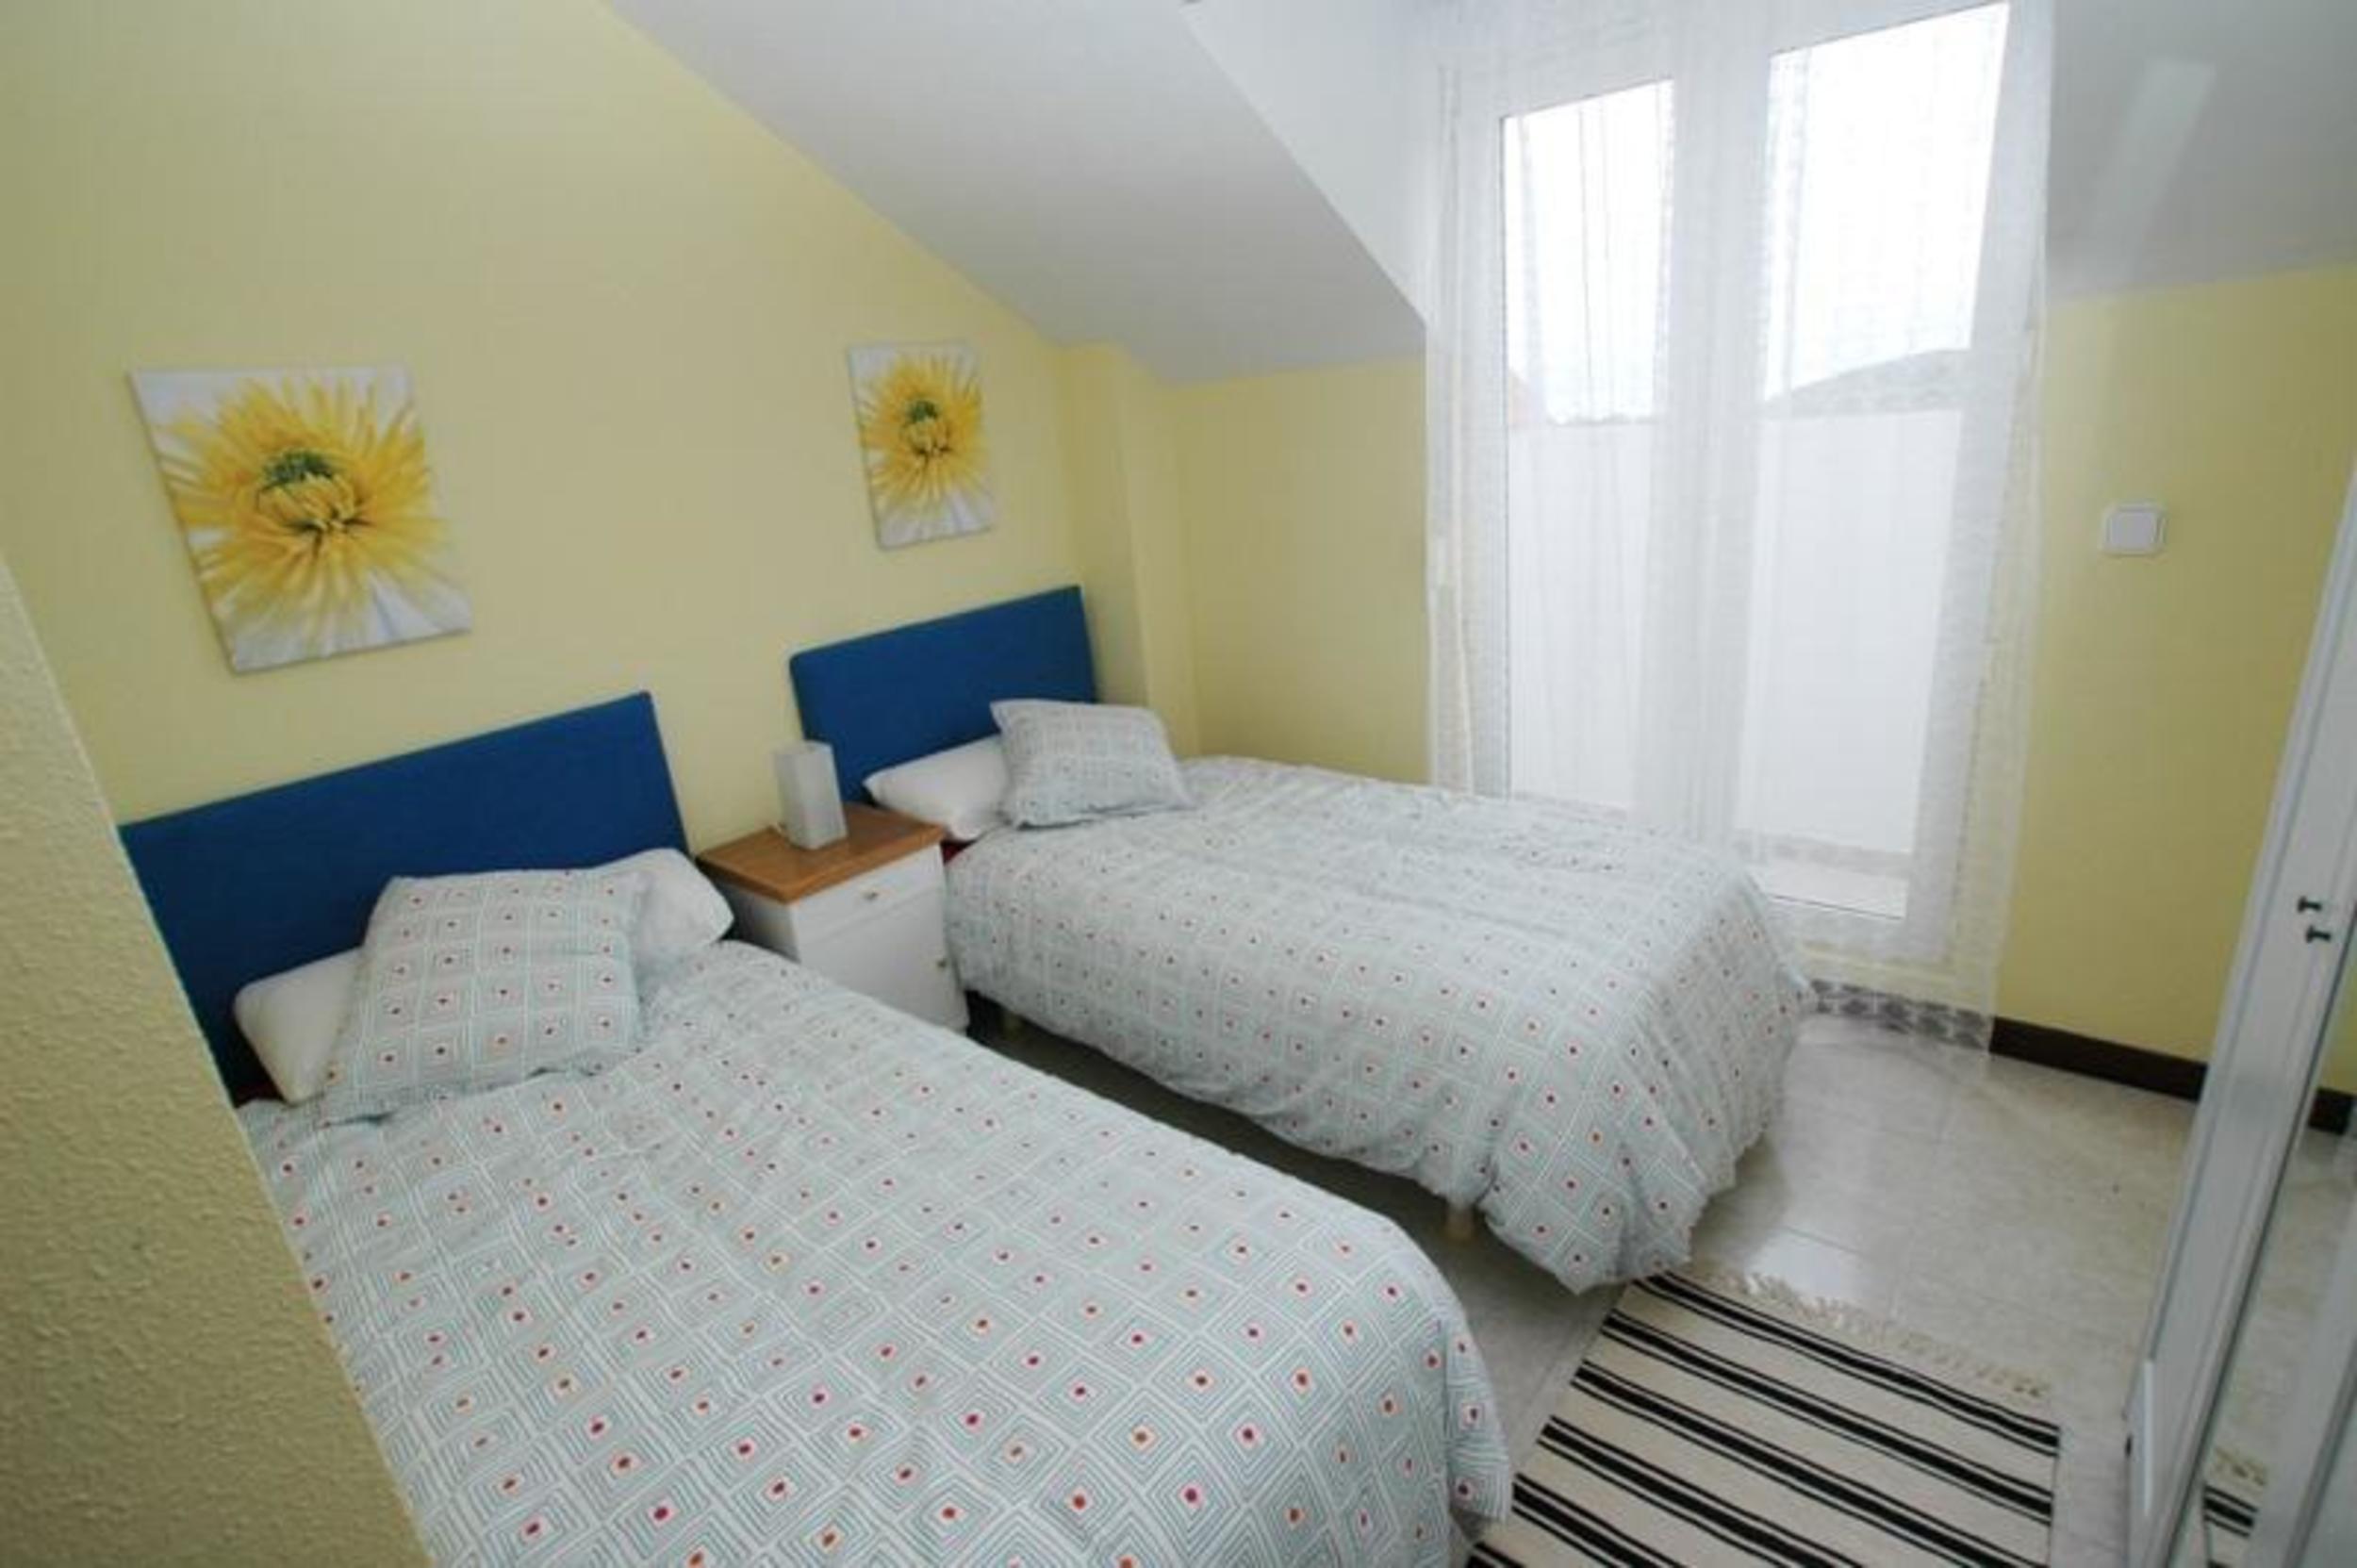 Ferienwohnung Apartment - 2 Bedrooms with Pool and Sea views - 102775 (2360880), Isla, Costa de Cantabria, Kantabrien, Spanien, Bild 6